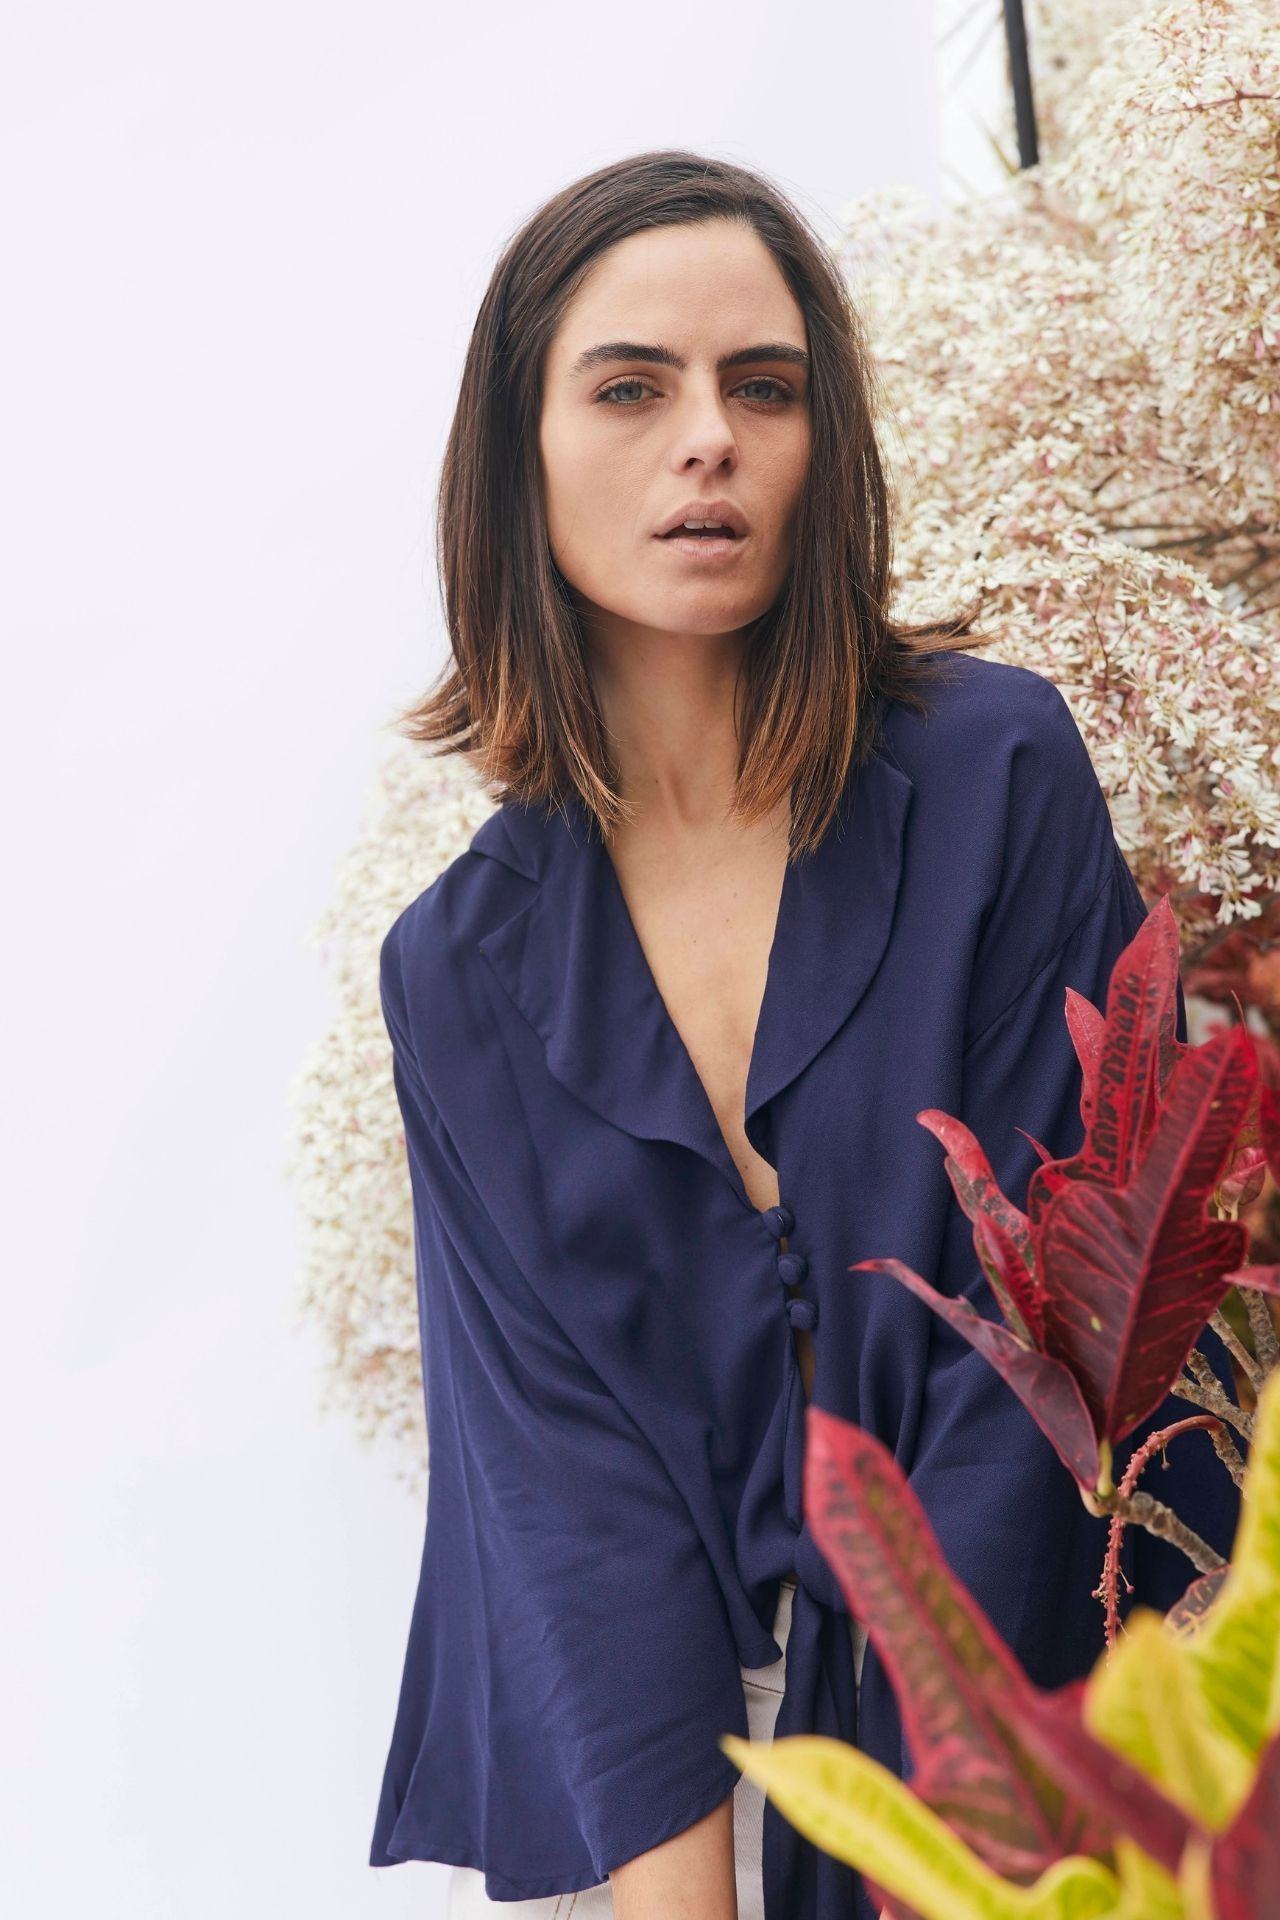 100% cotton blouse, perfect for mid season.  Small:  ancho: 49 cm largo: 43 cm  Medium:  ancho: 51 cm largo: 45 cm